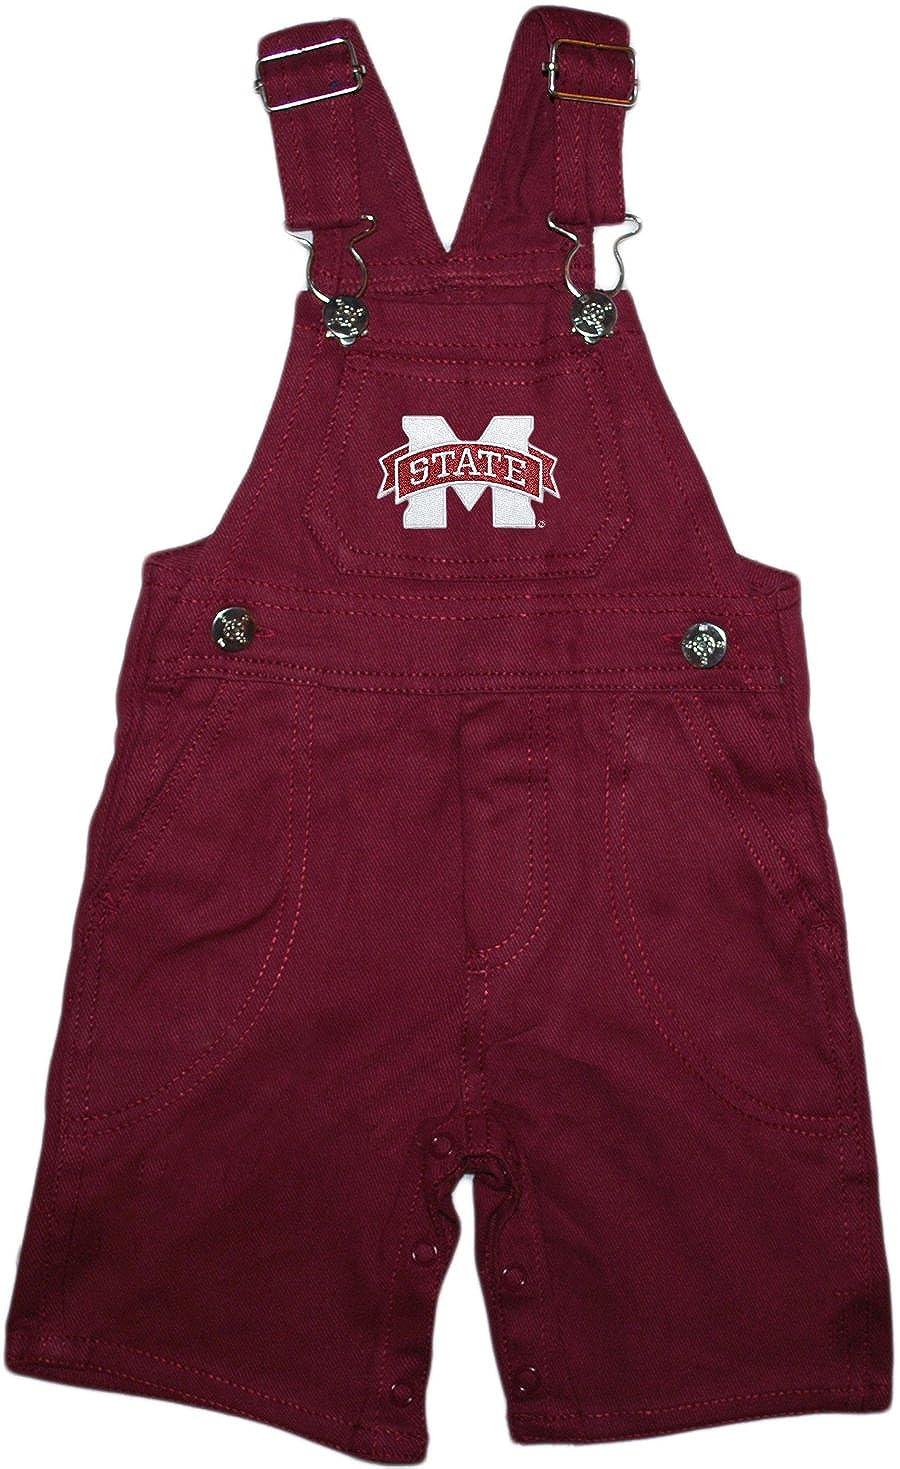 Mississippi State University Baby Overalls